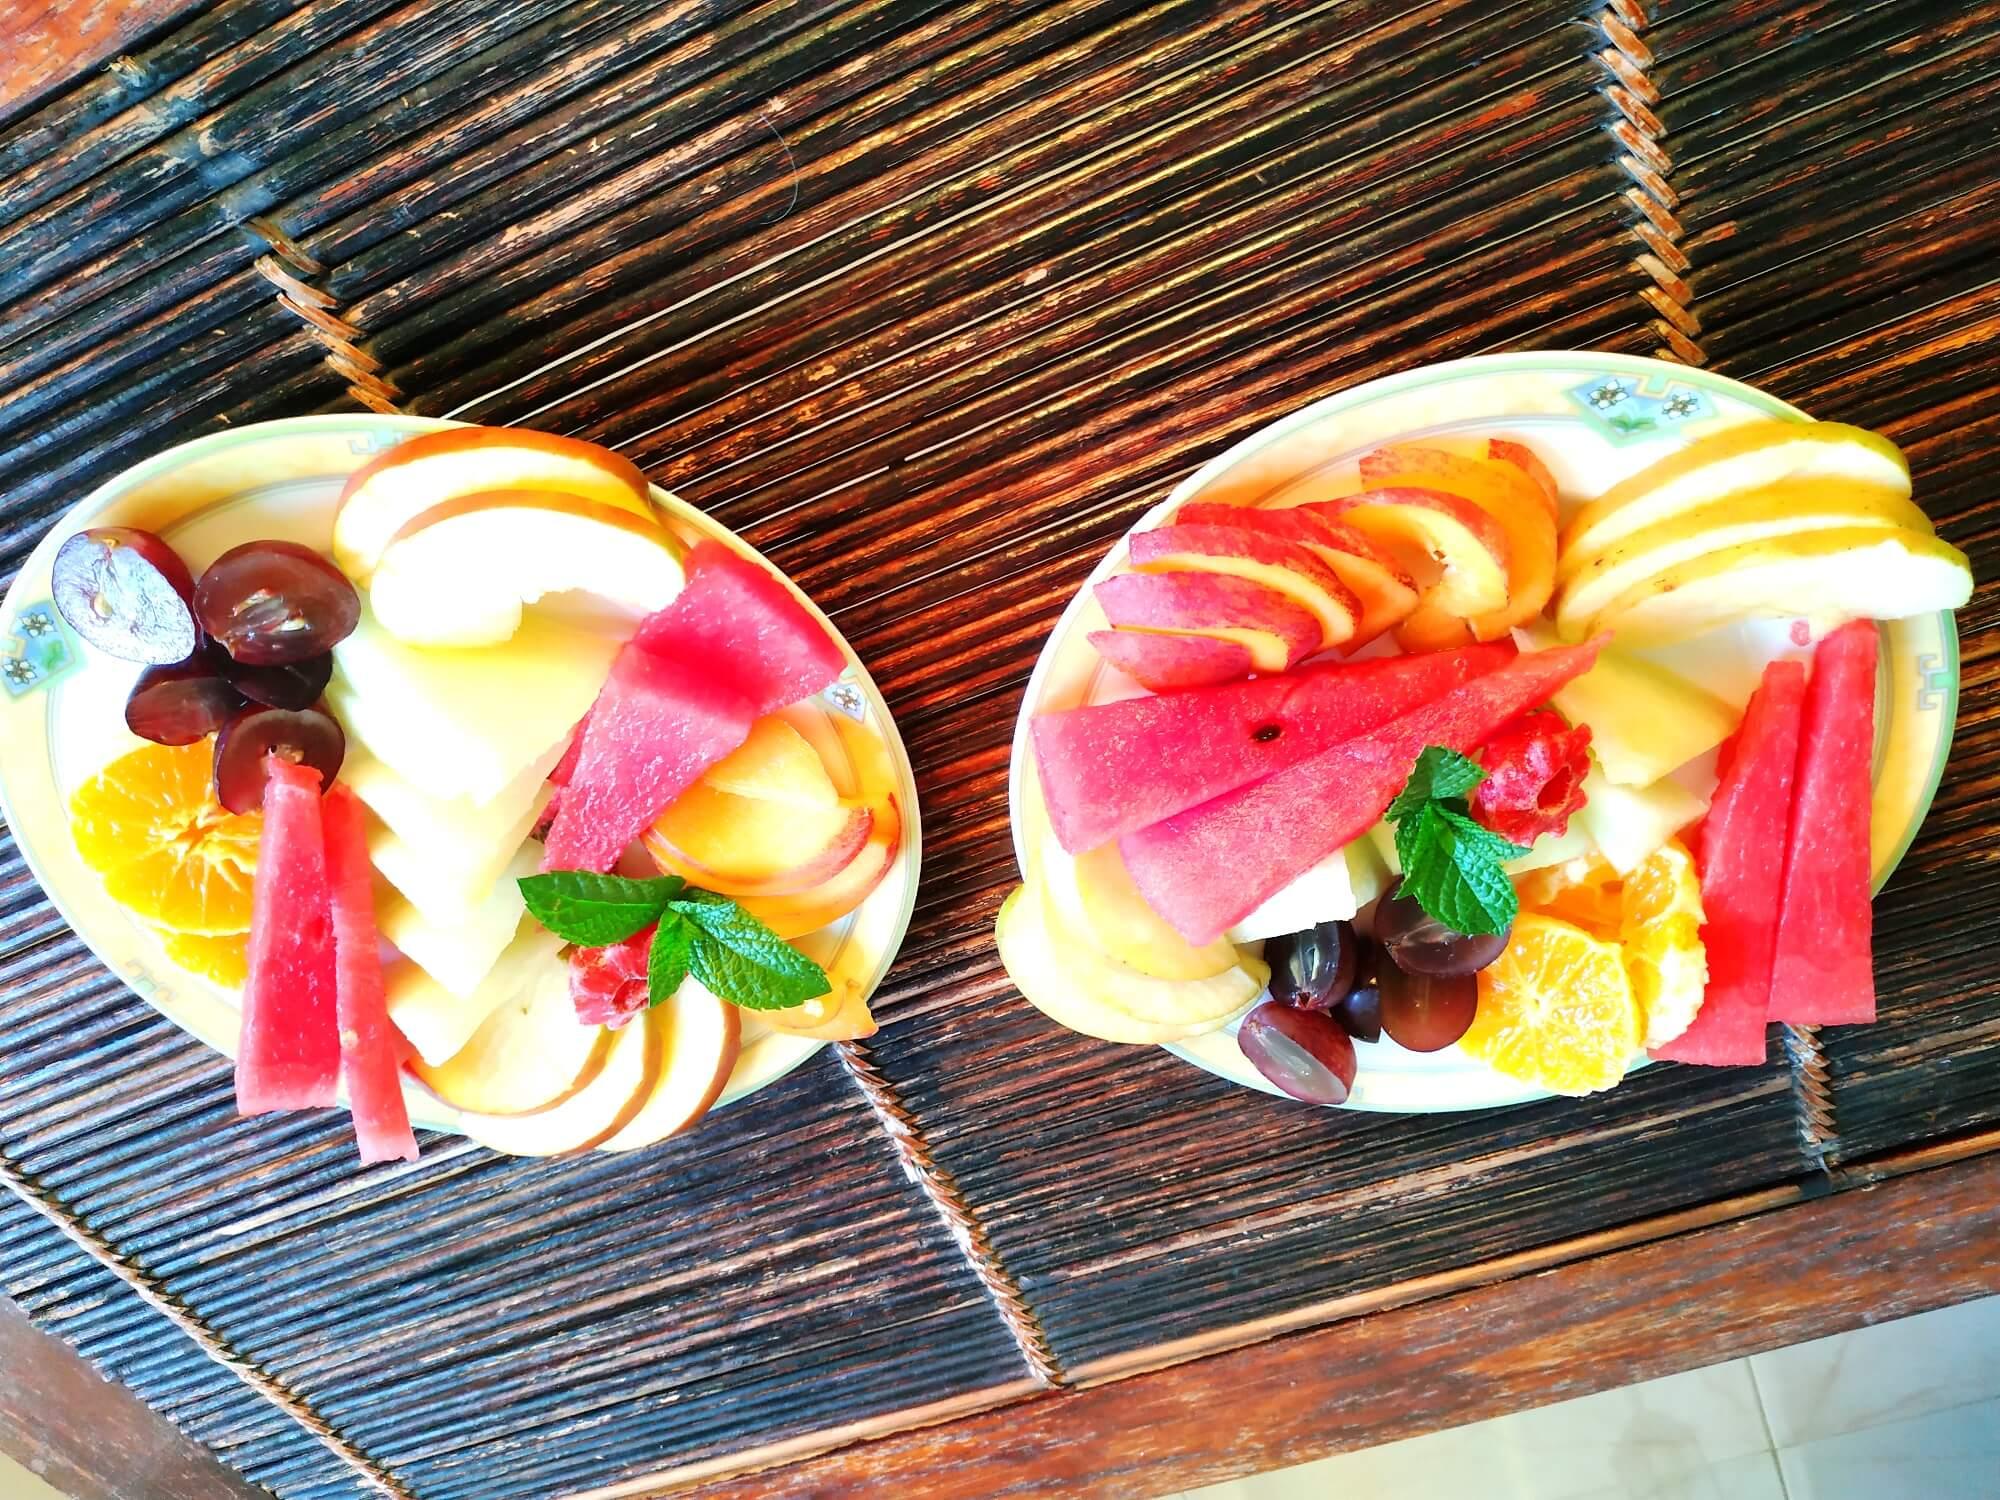 platos de frutas